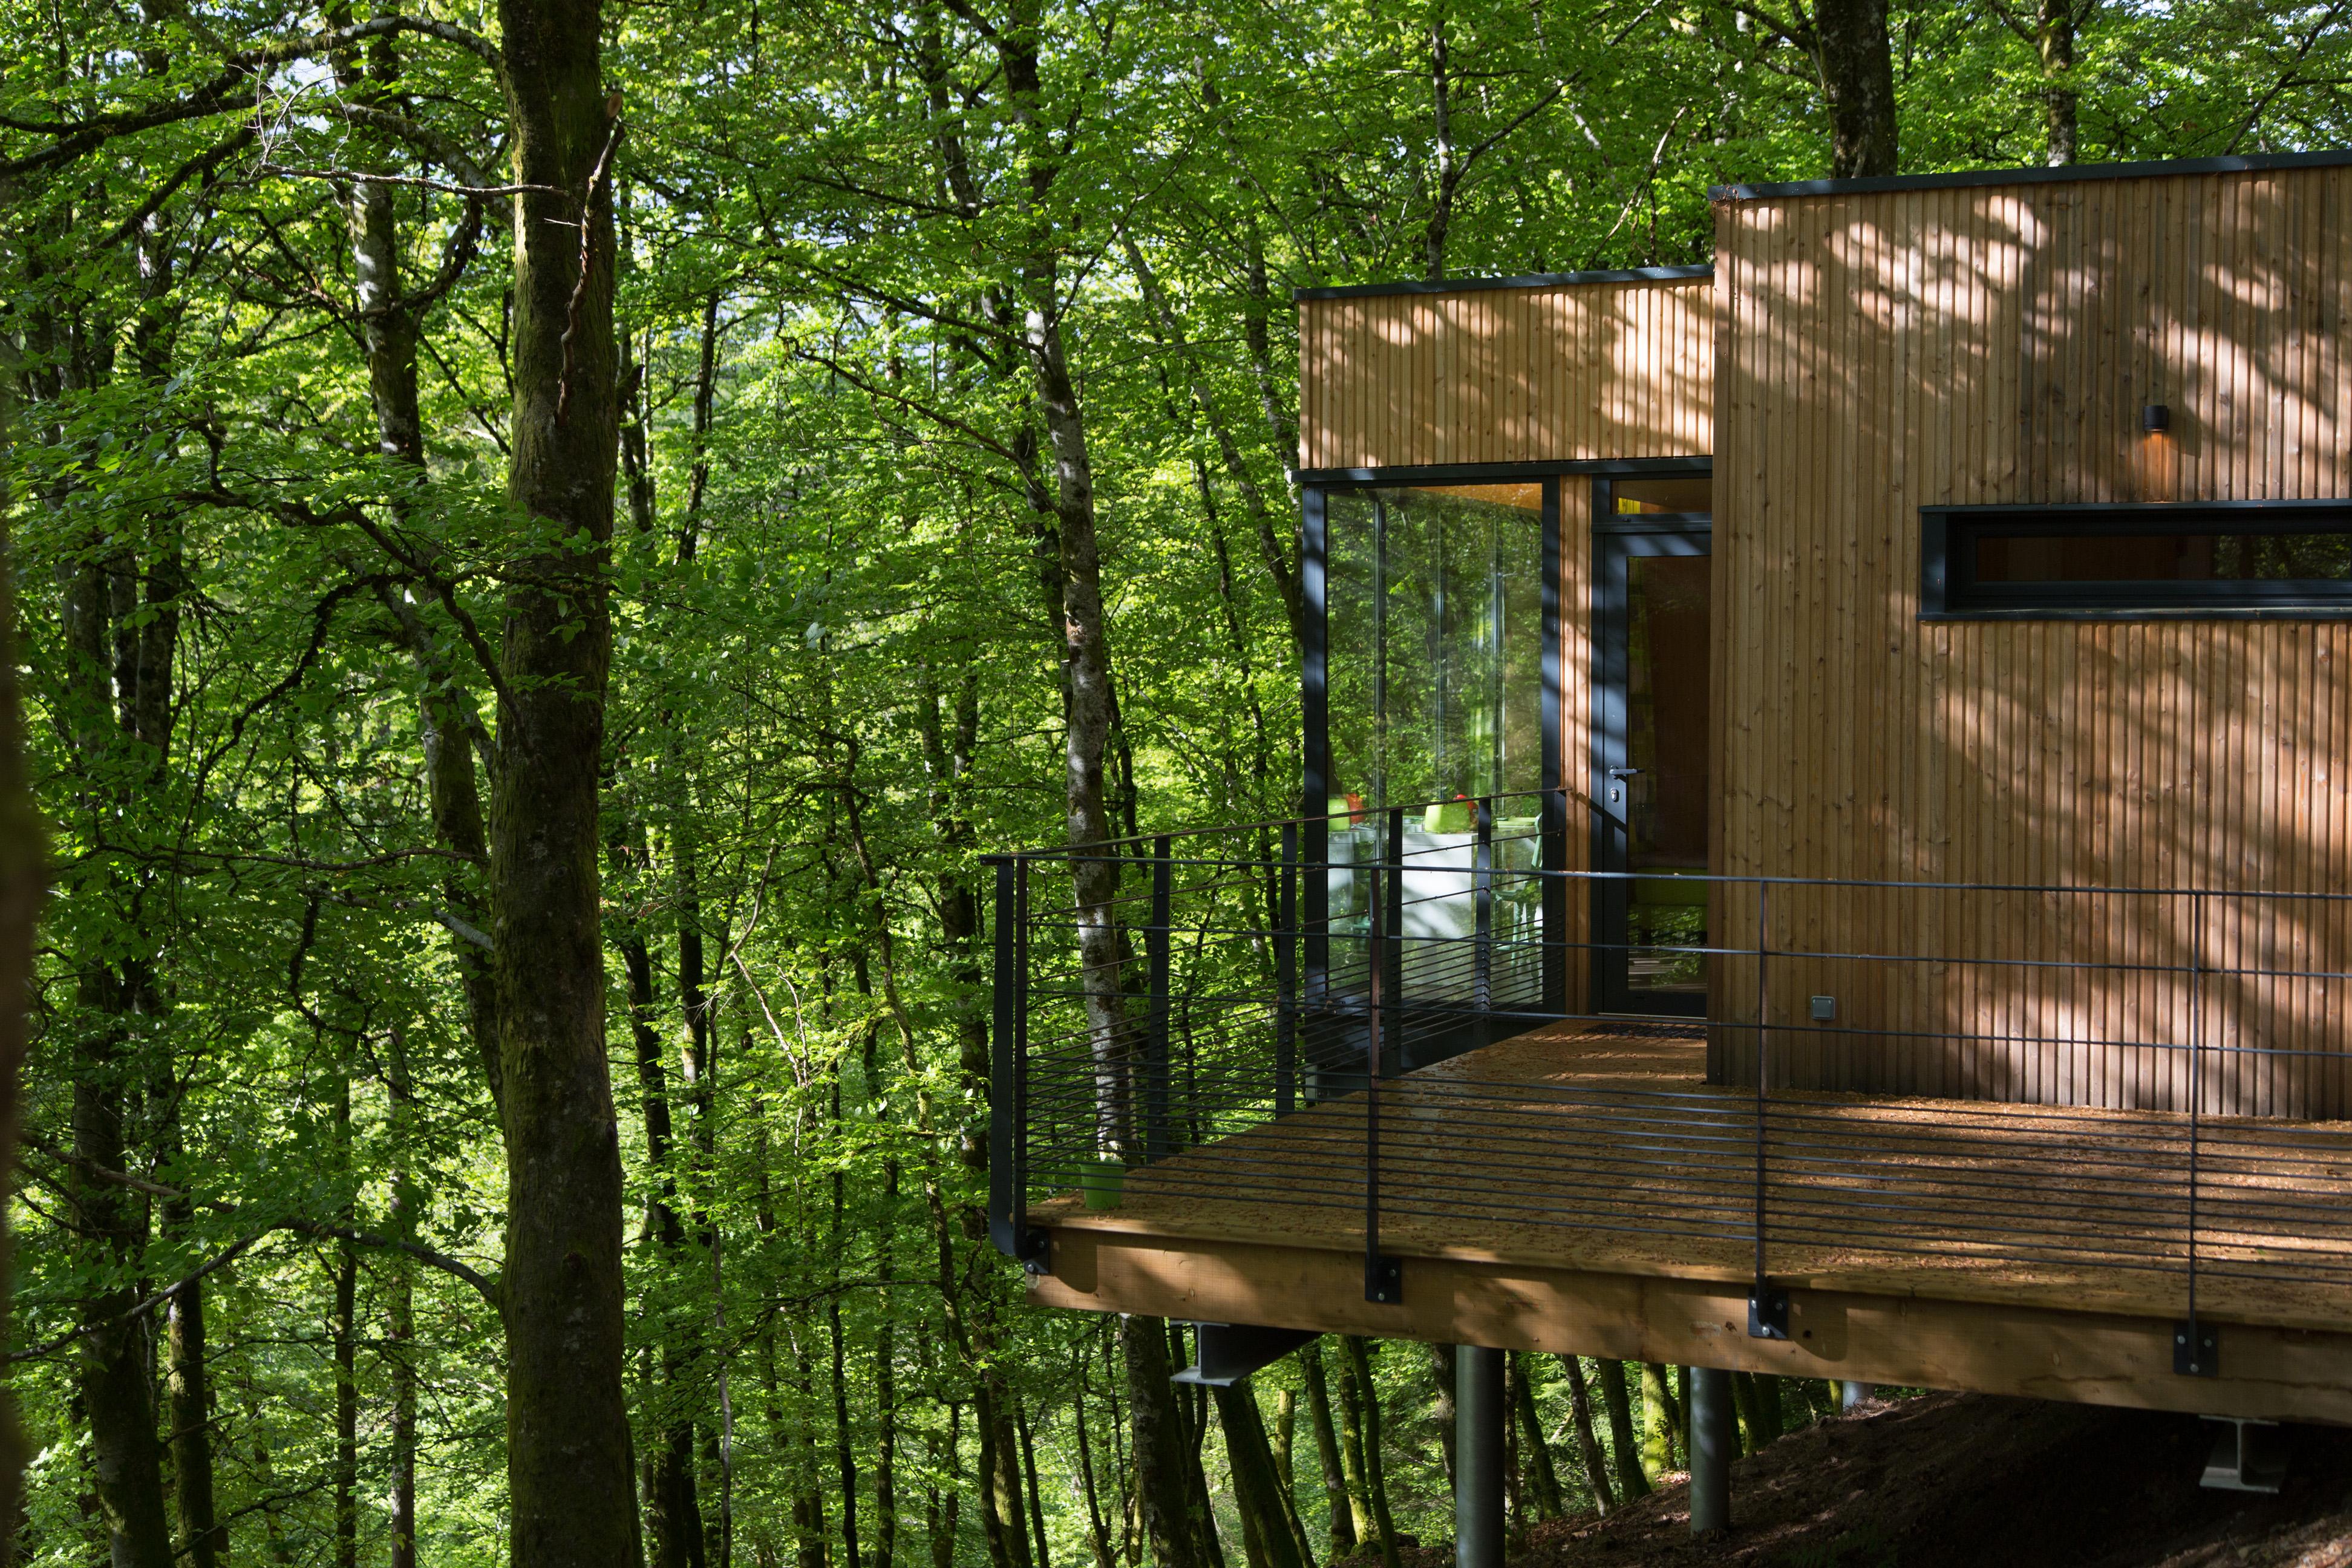 cabane de salagnac c dre gris canopy stars. Black Bedroom Furniture Sets. Home Design Ideas